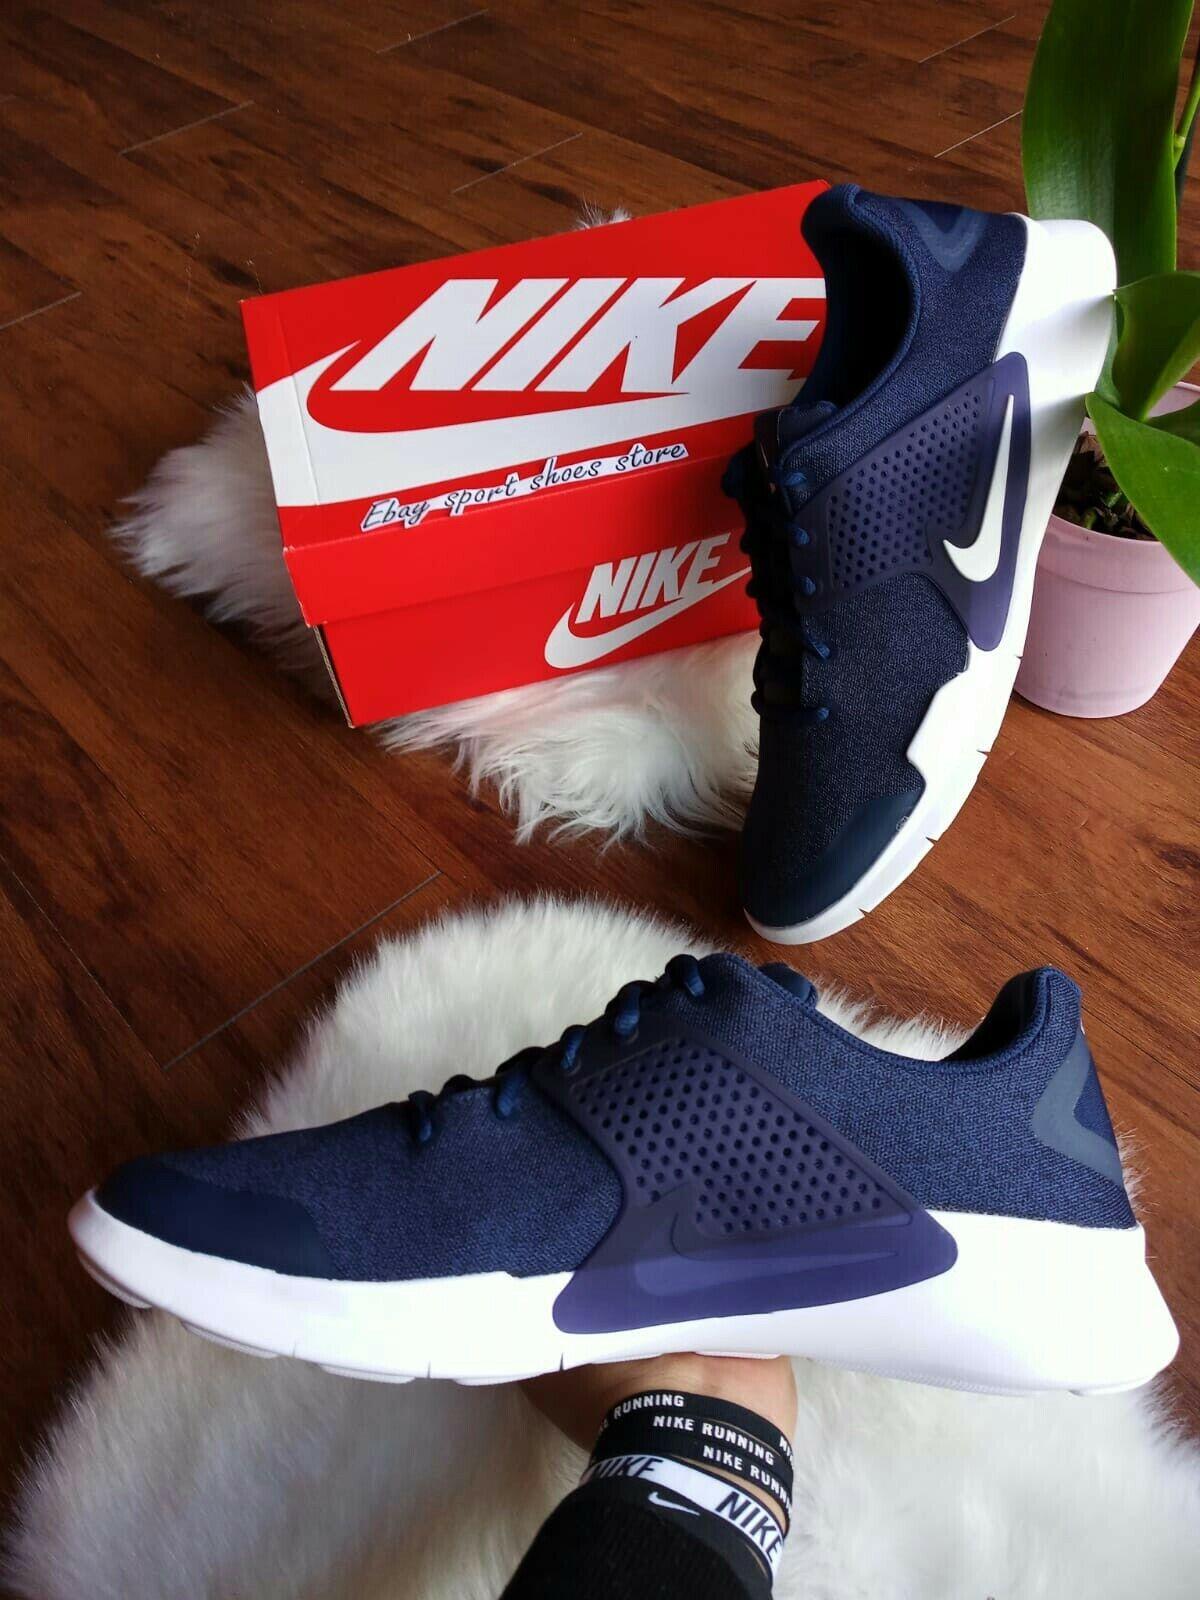 Taille 13 Homme NIKE AIR ARROWZ blanc bleu 902813 401 Casual Running chaussures